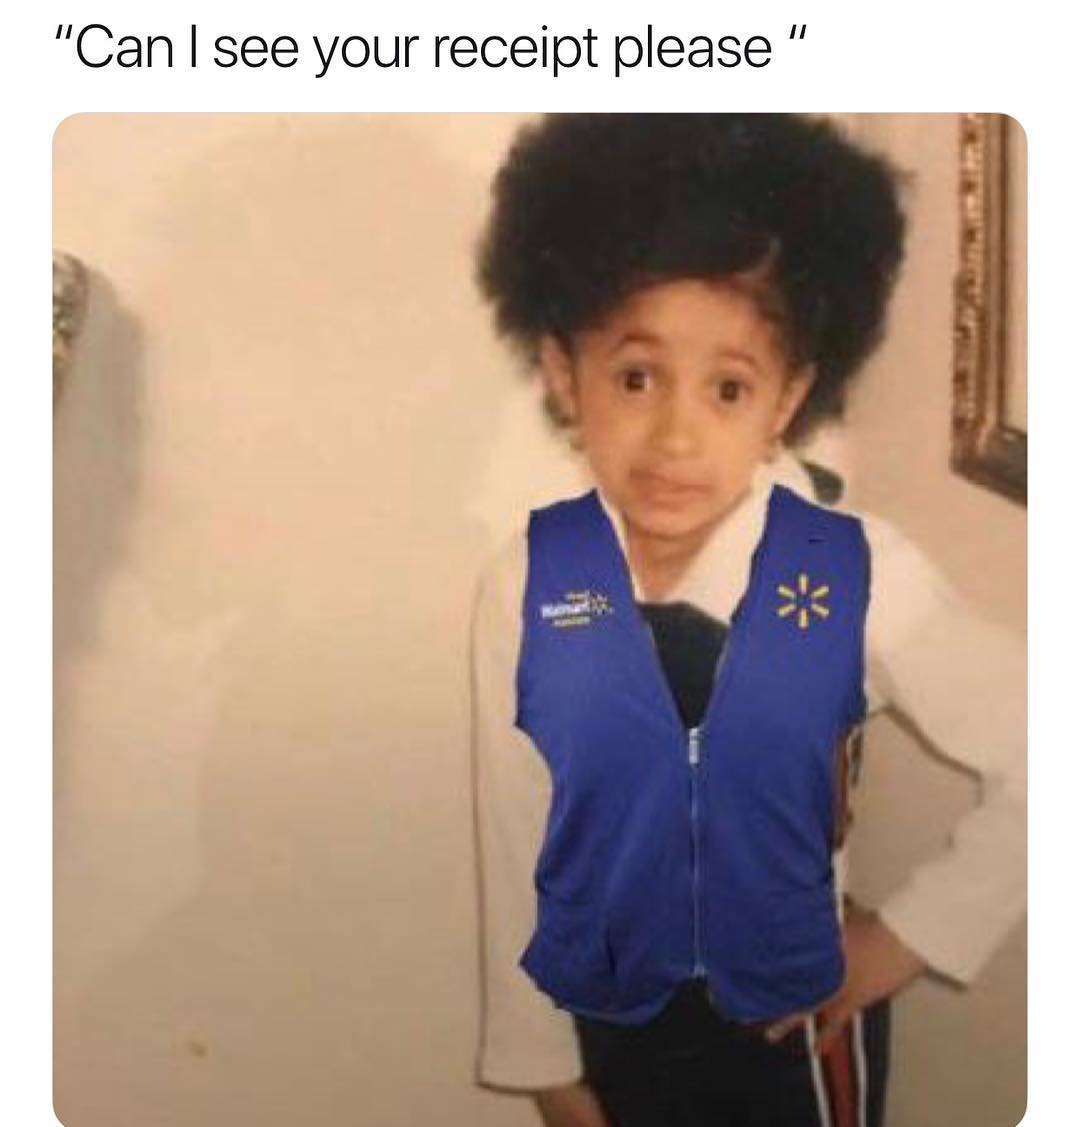 Funny - Cardi B, Walmart.jpg